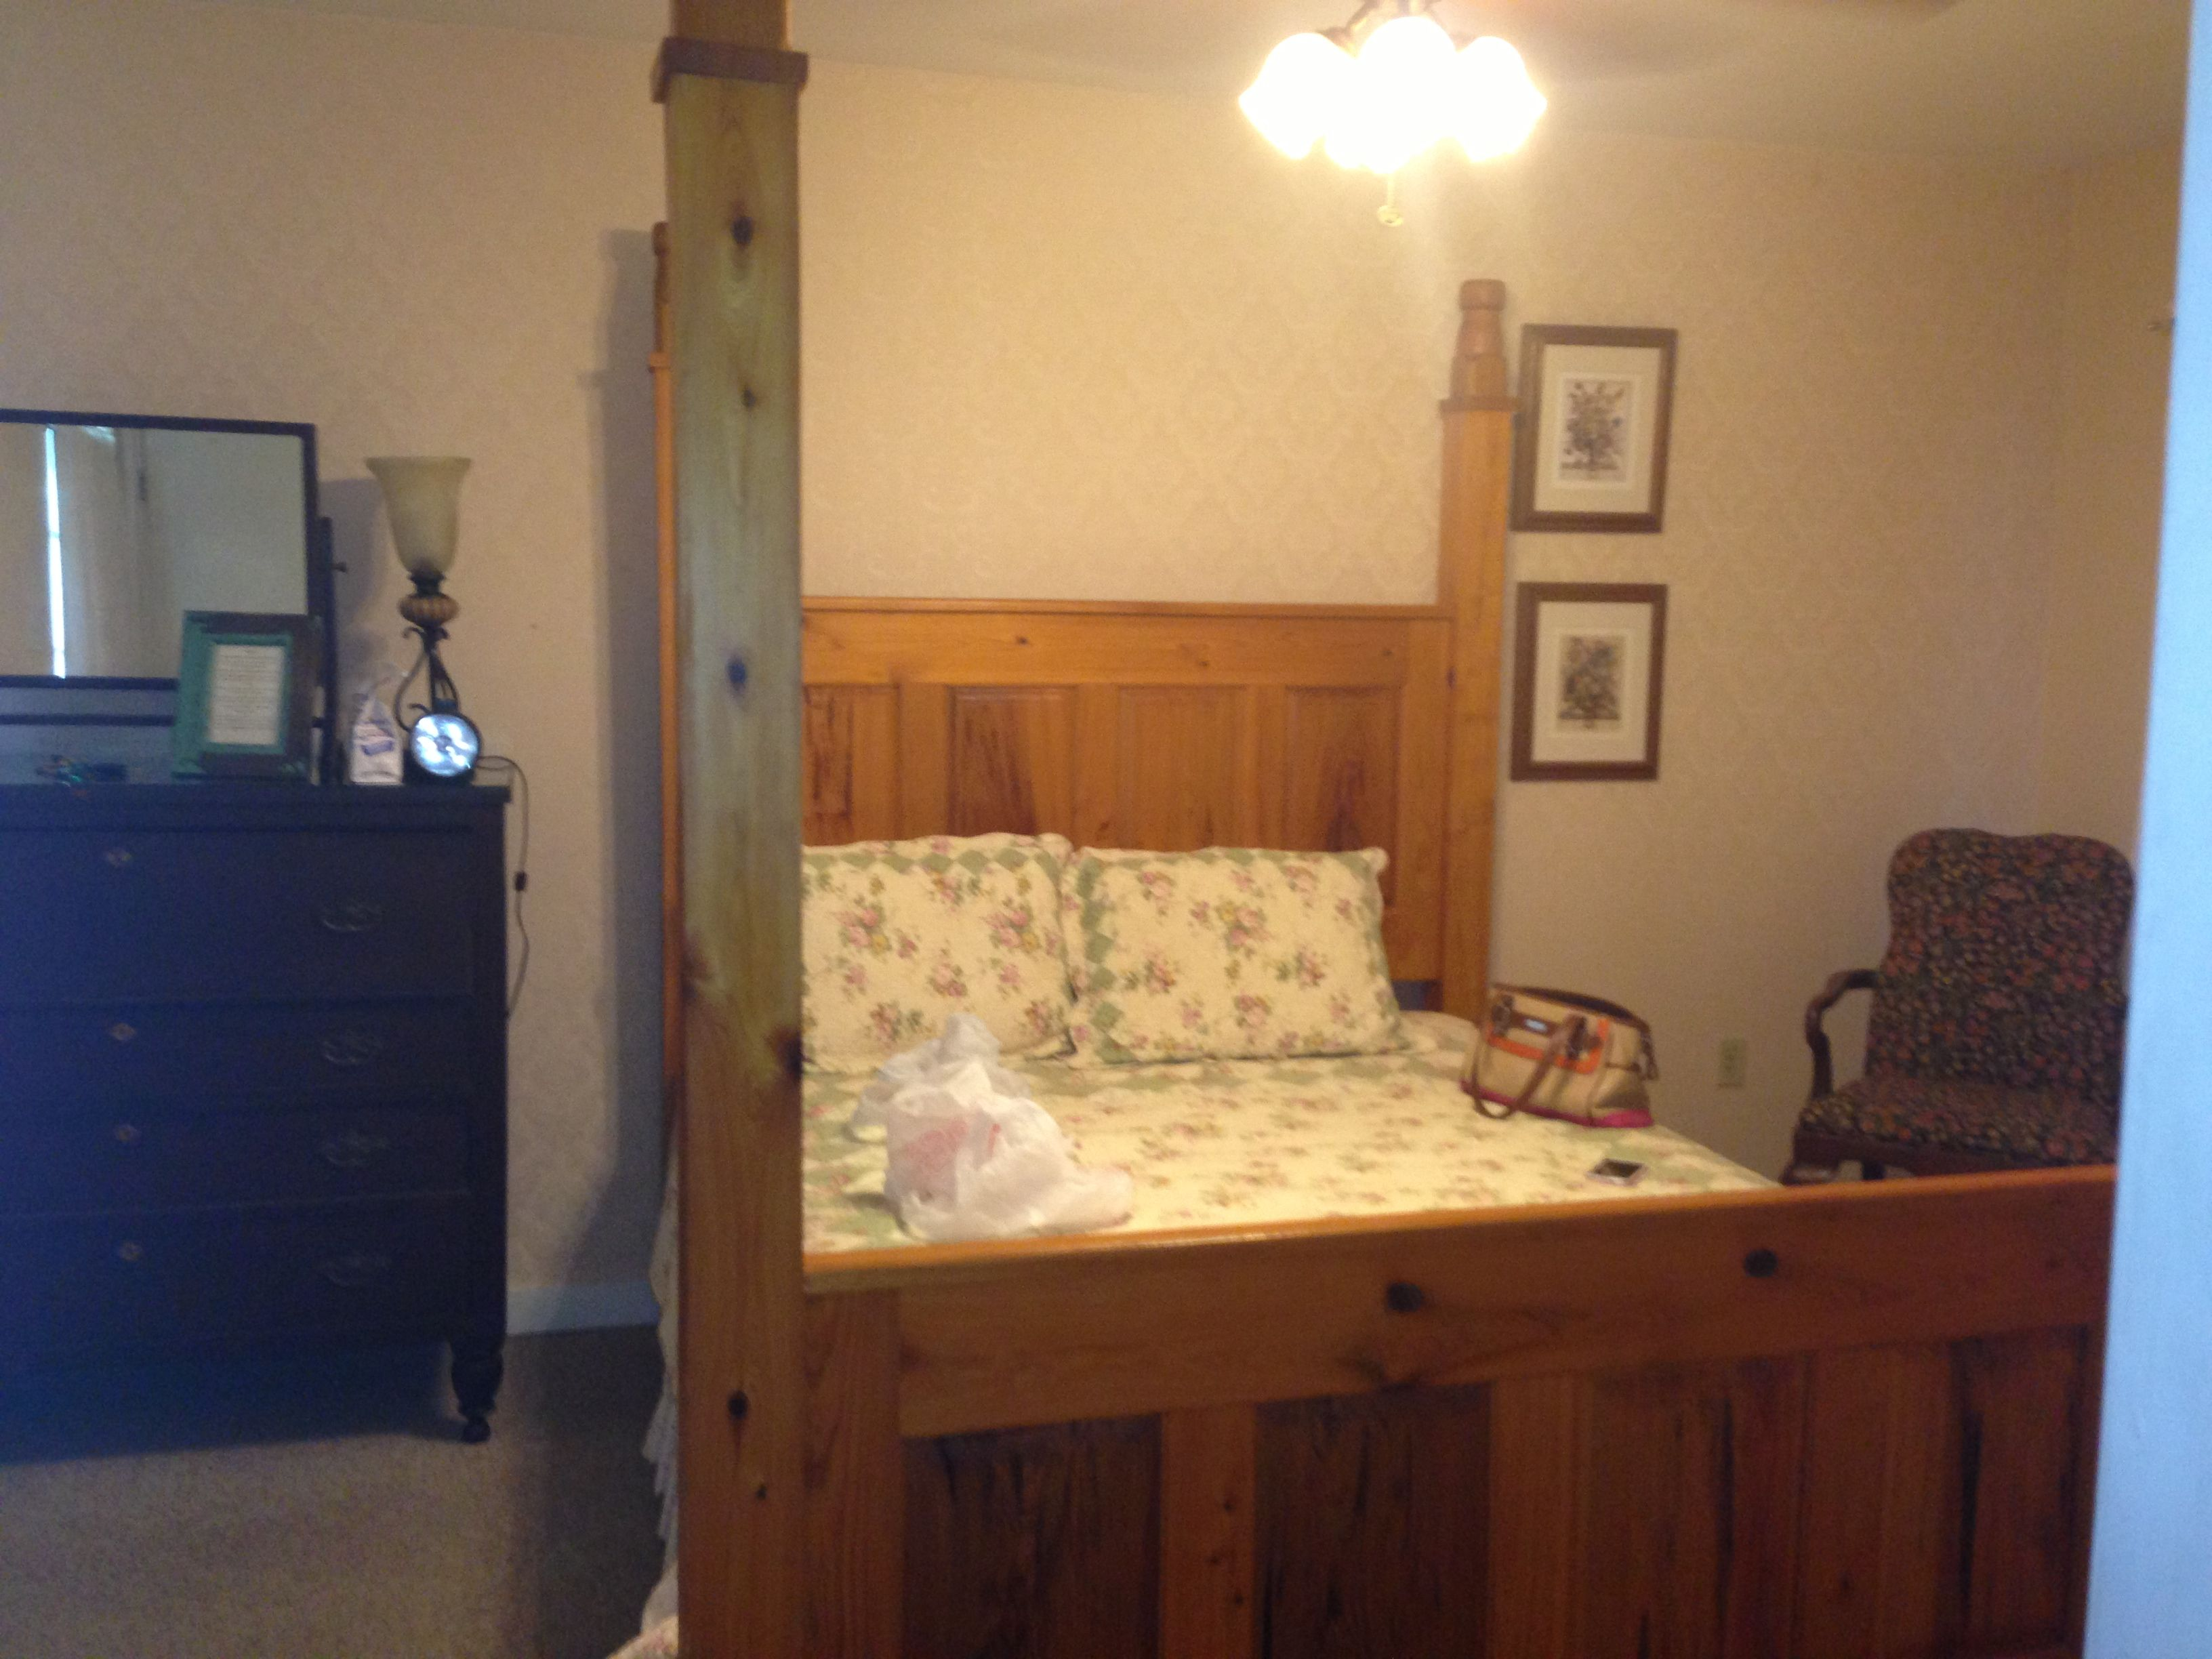 Azalea Room Myrtles Plantation Home decor, Room, Furniture